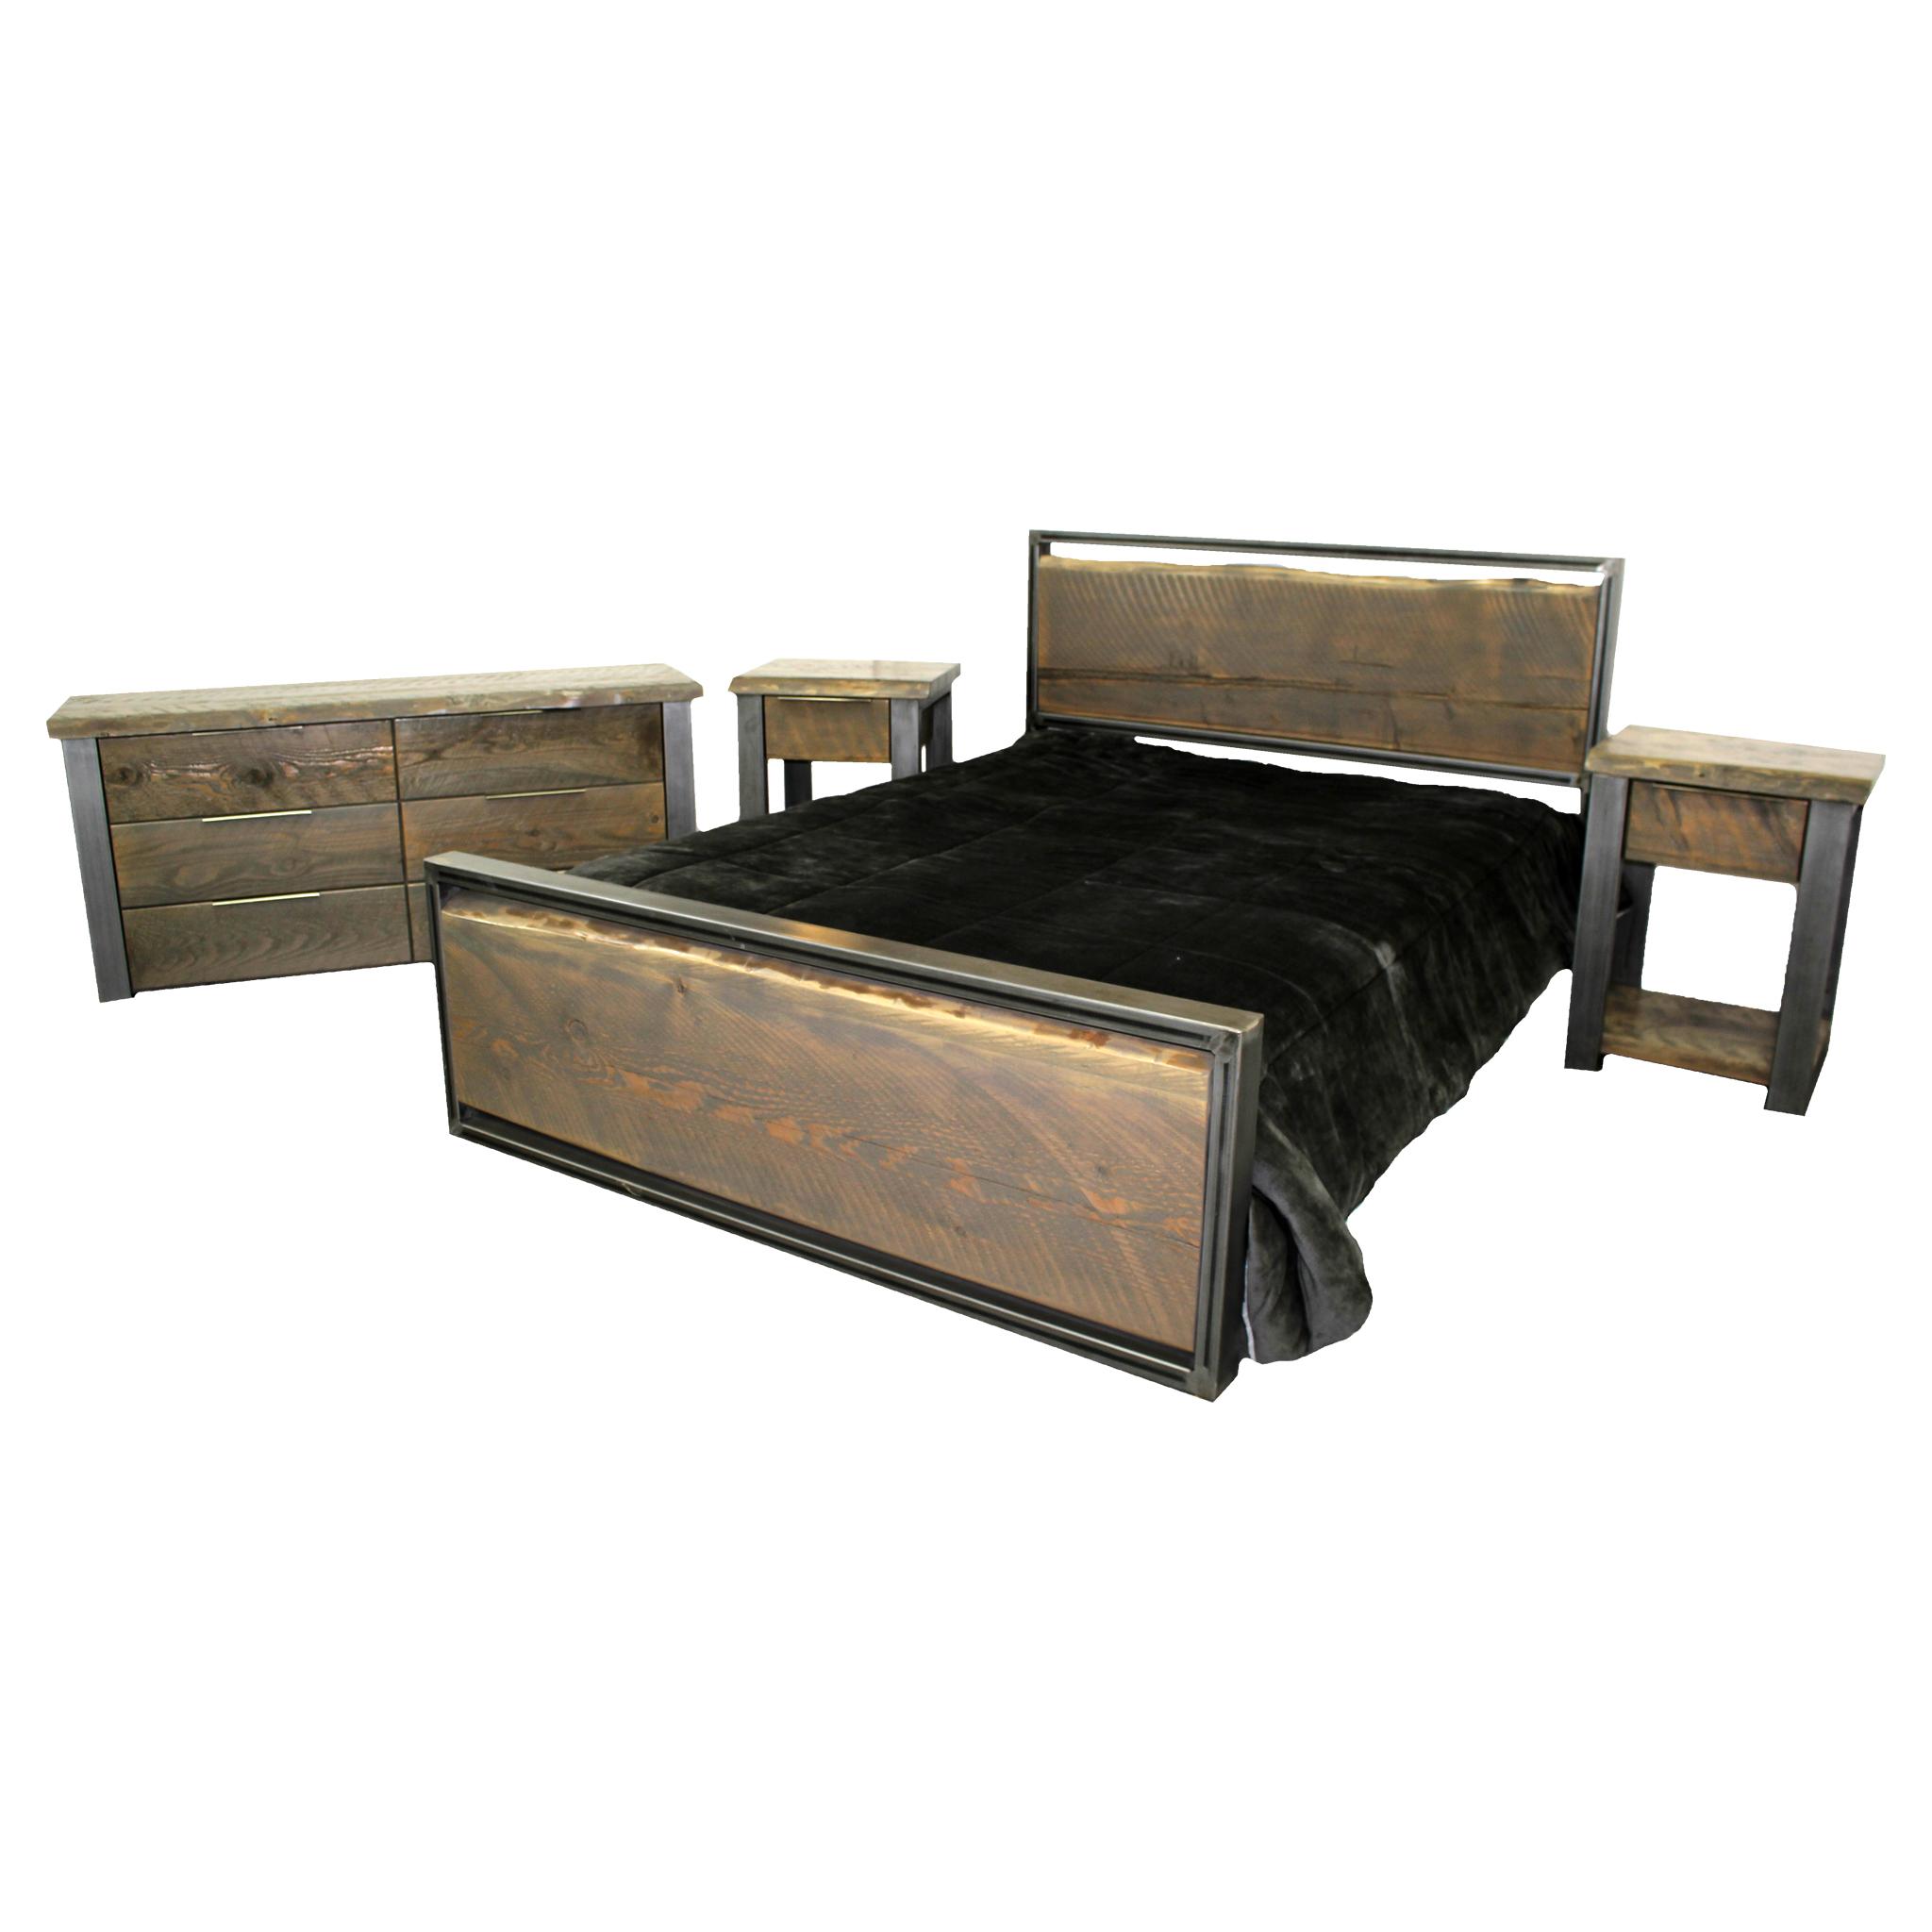 Modern Metal Bed With Live Edge Slab Four Corner Furniture Bozeman Mt